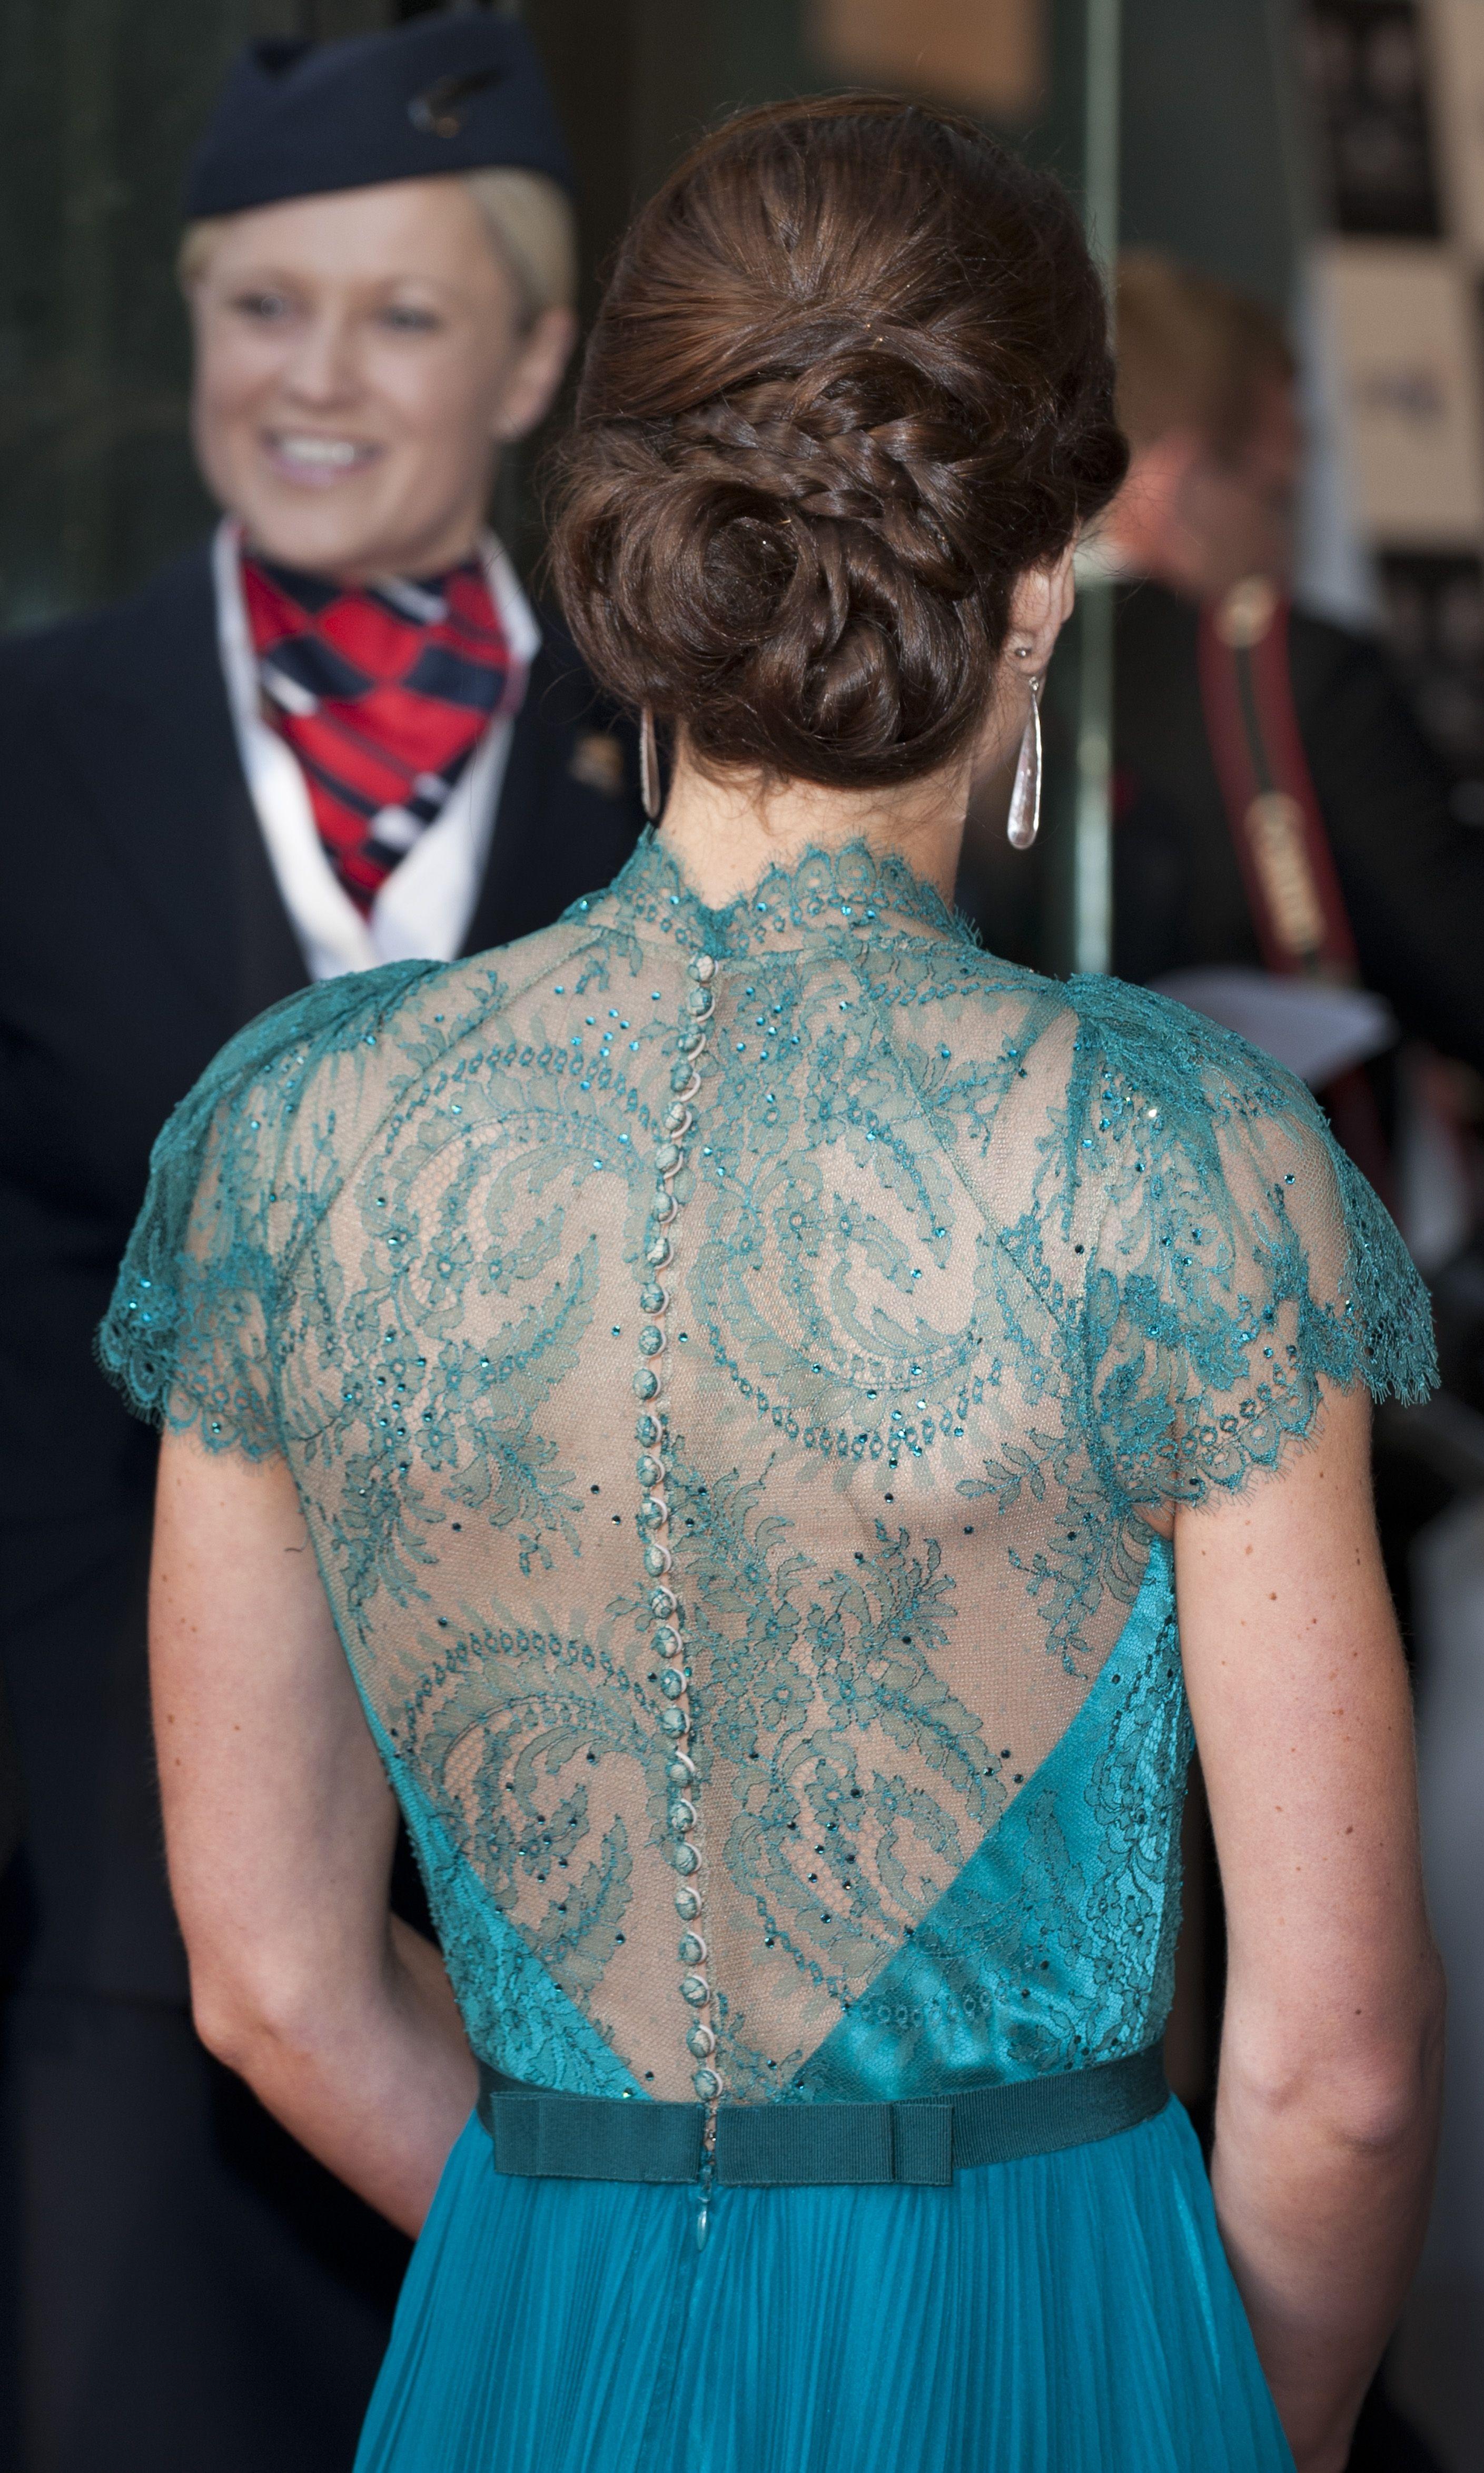 Vestido con espalda de encaje de Jenny Packham para Kate Middleton ...